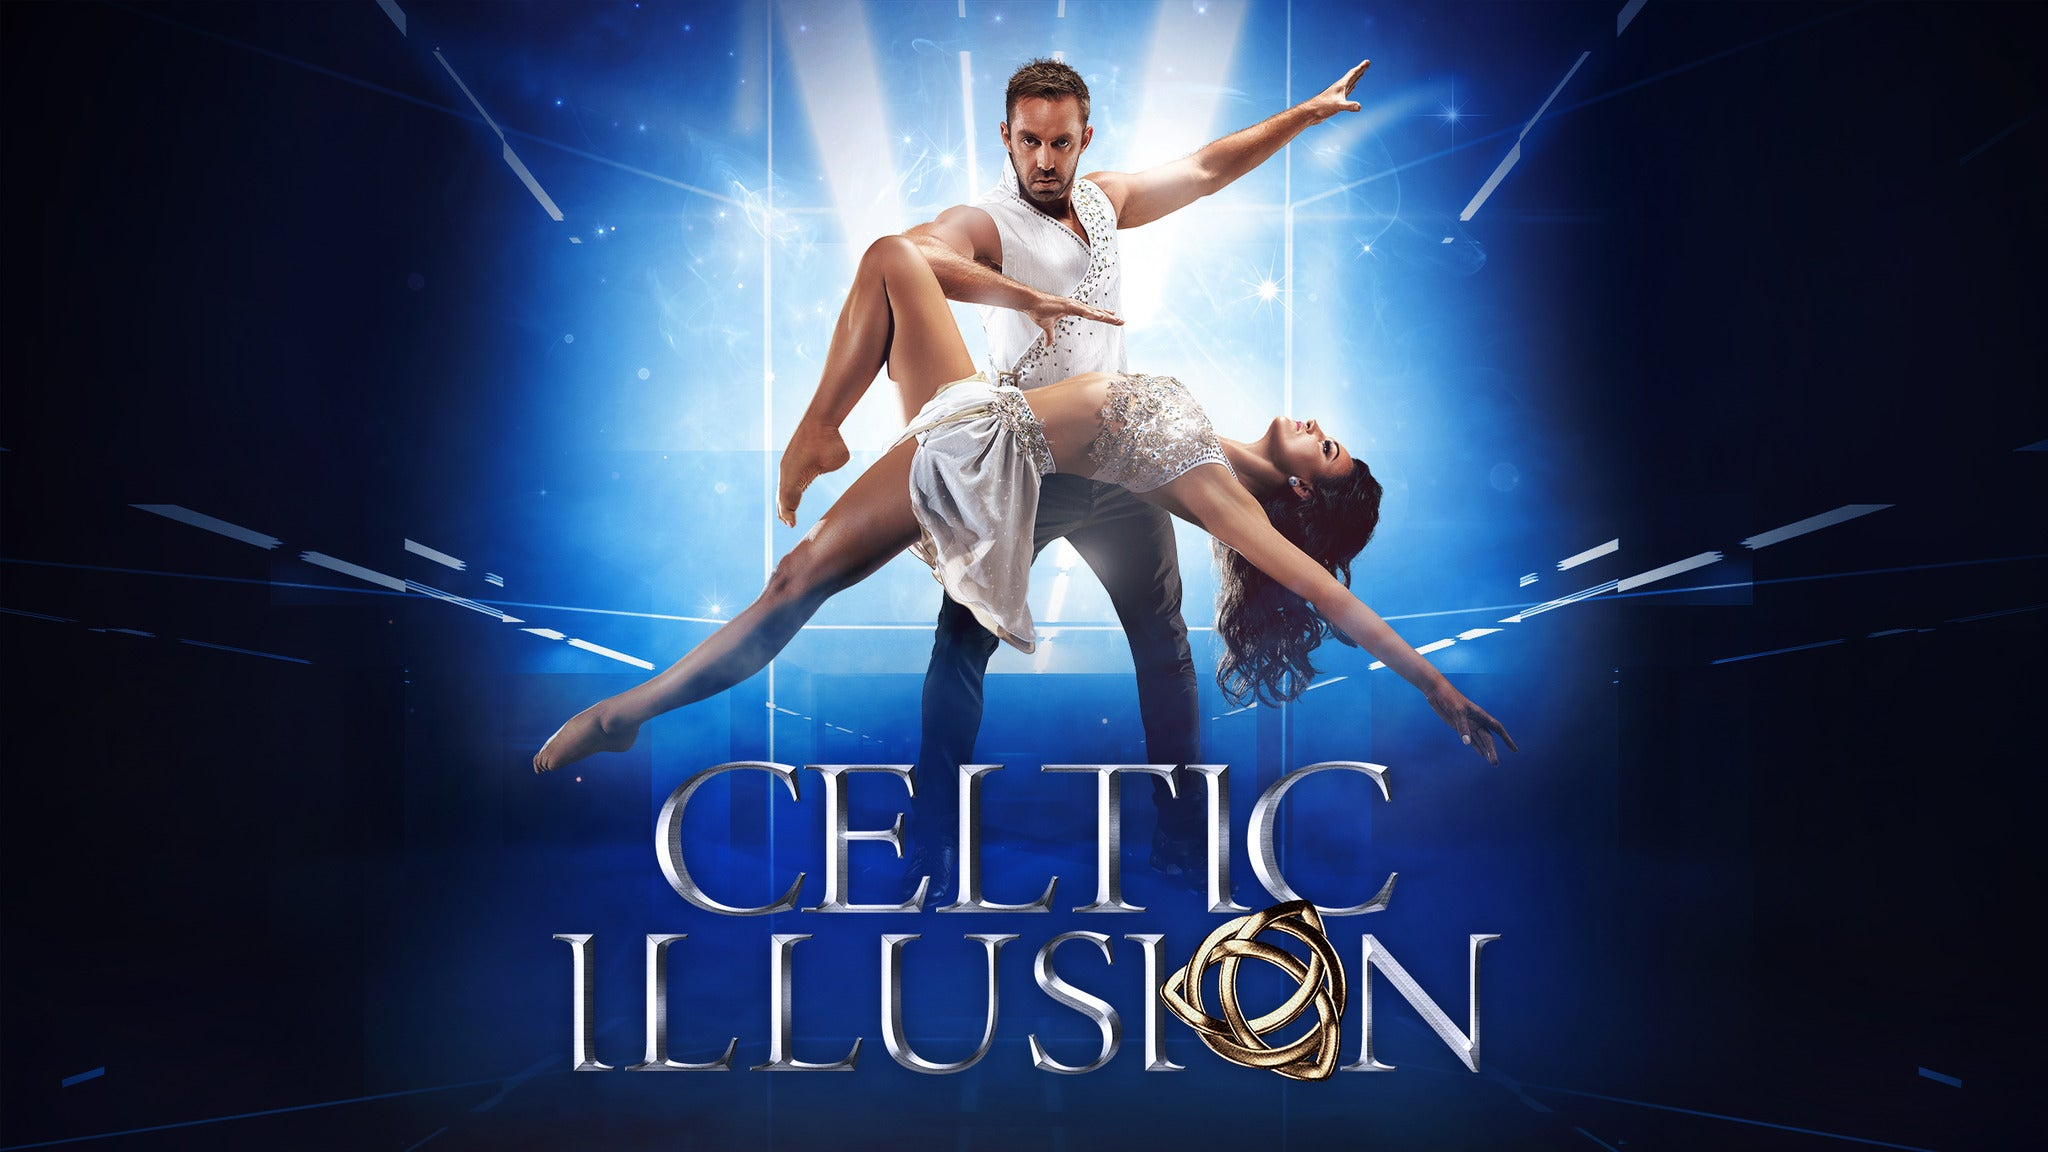 Celtic Illusion at Northern Alberta Jubilee Auditorium